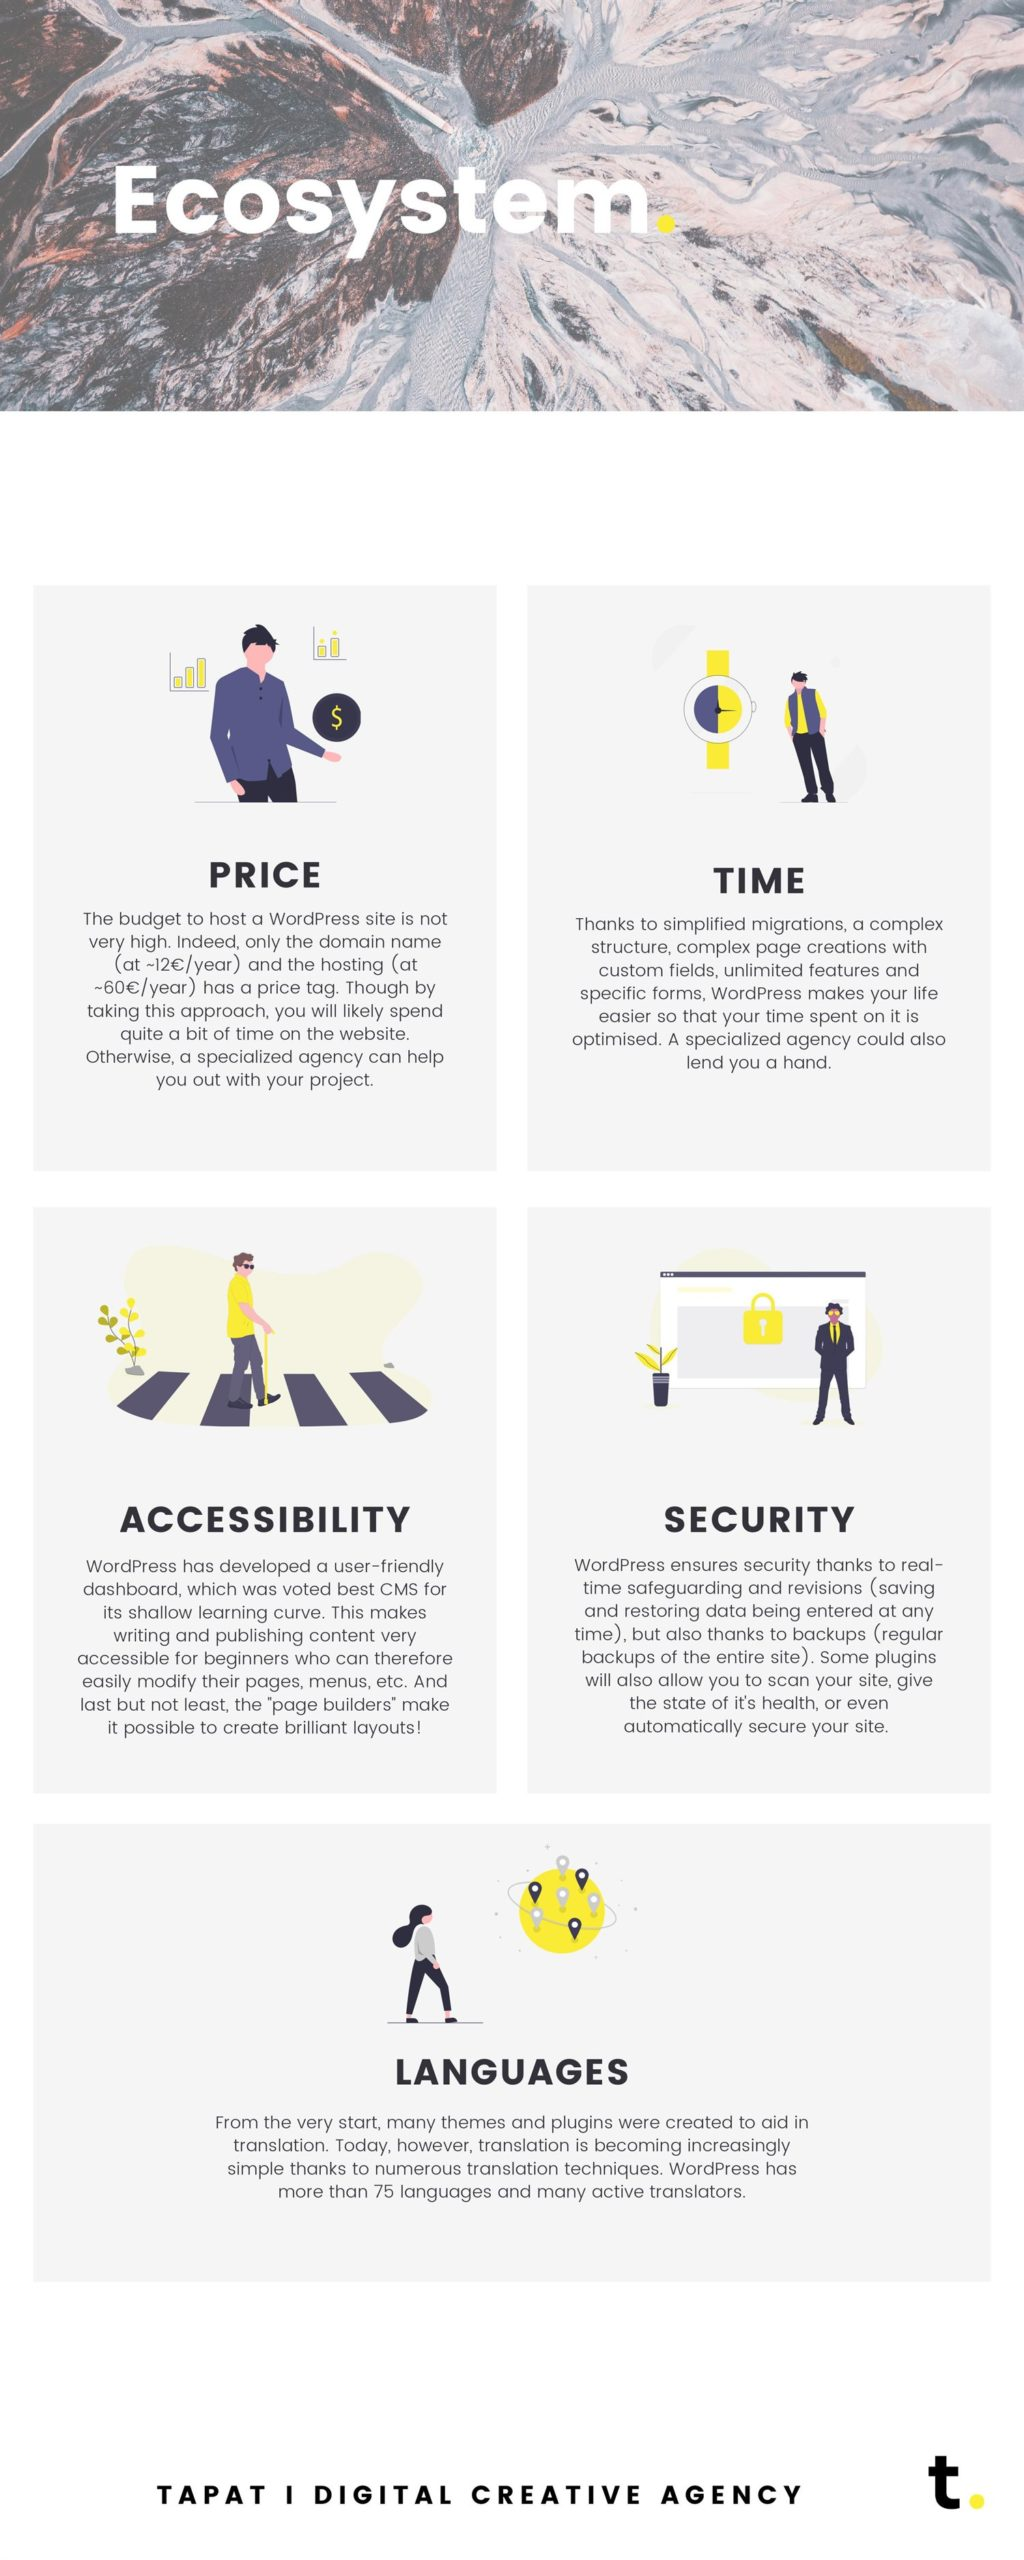 Wordpress infographic 03 ecosystem - tapat creative agency